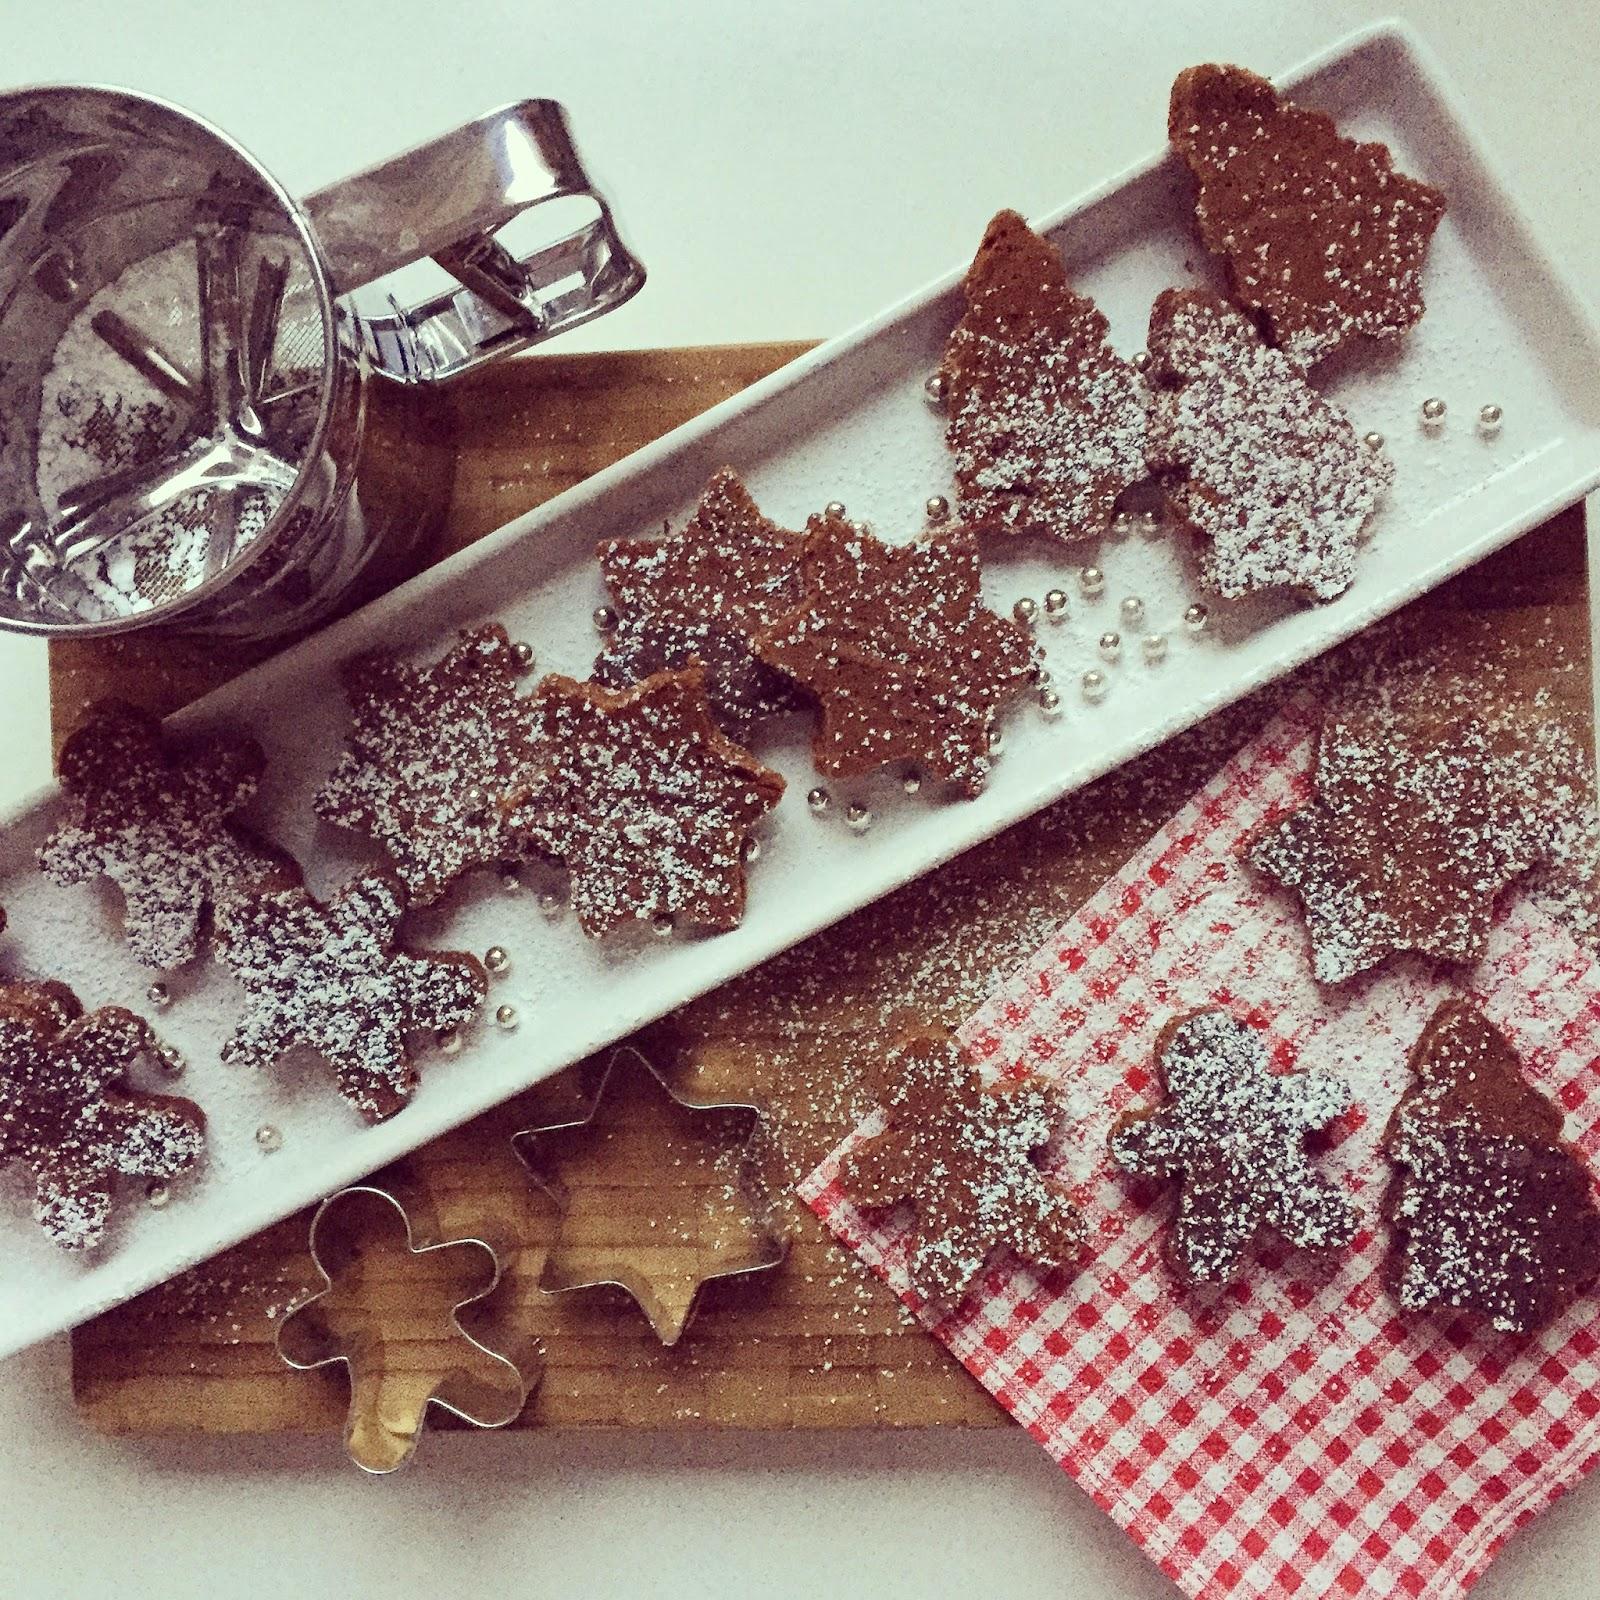 berg k sst k ste advent advent rezept f r winterliche lebkuchen brownies. Black Bedroom Furniture Sets. Home Design Ideas